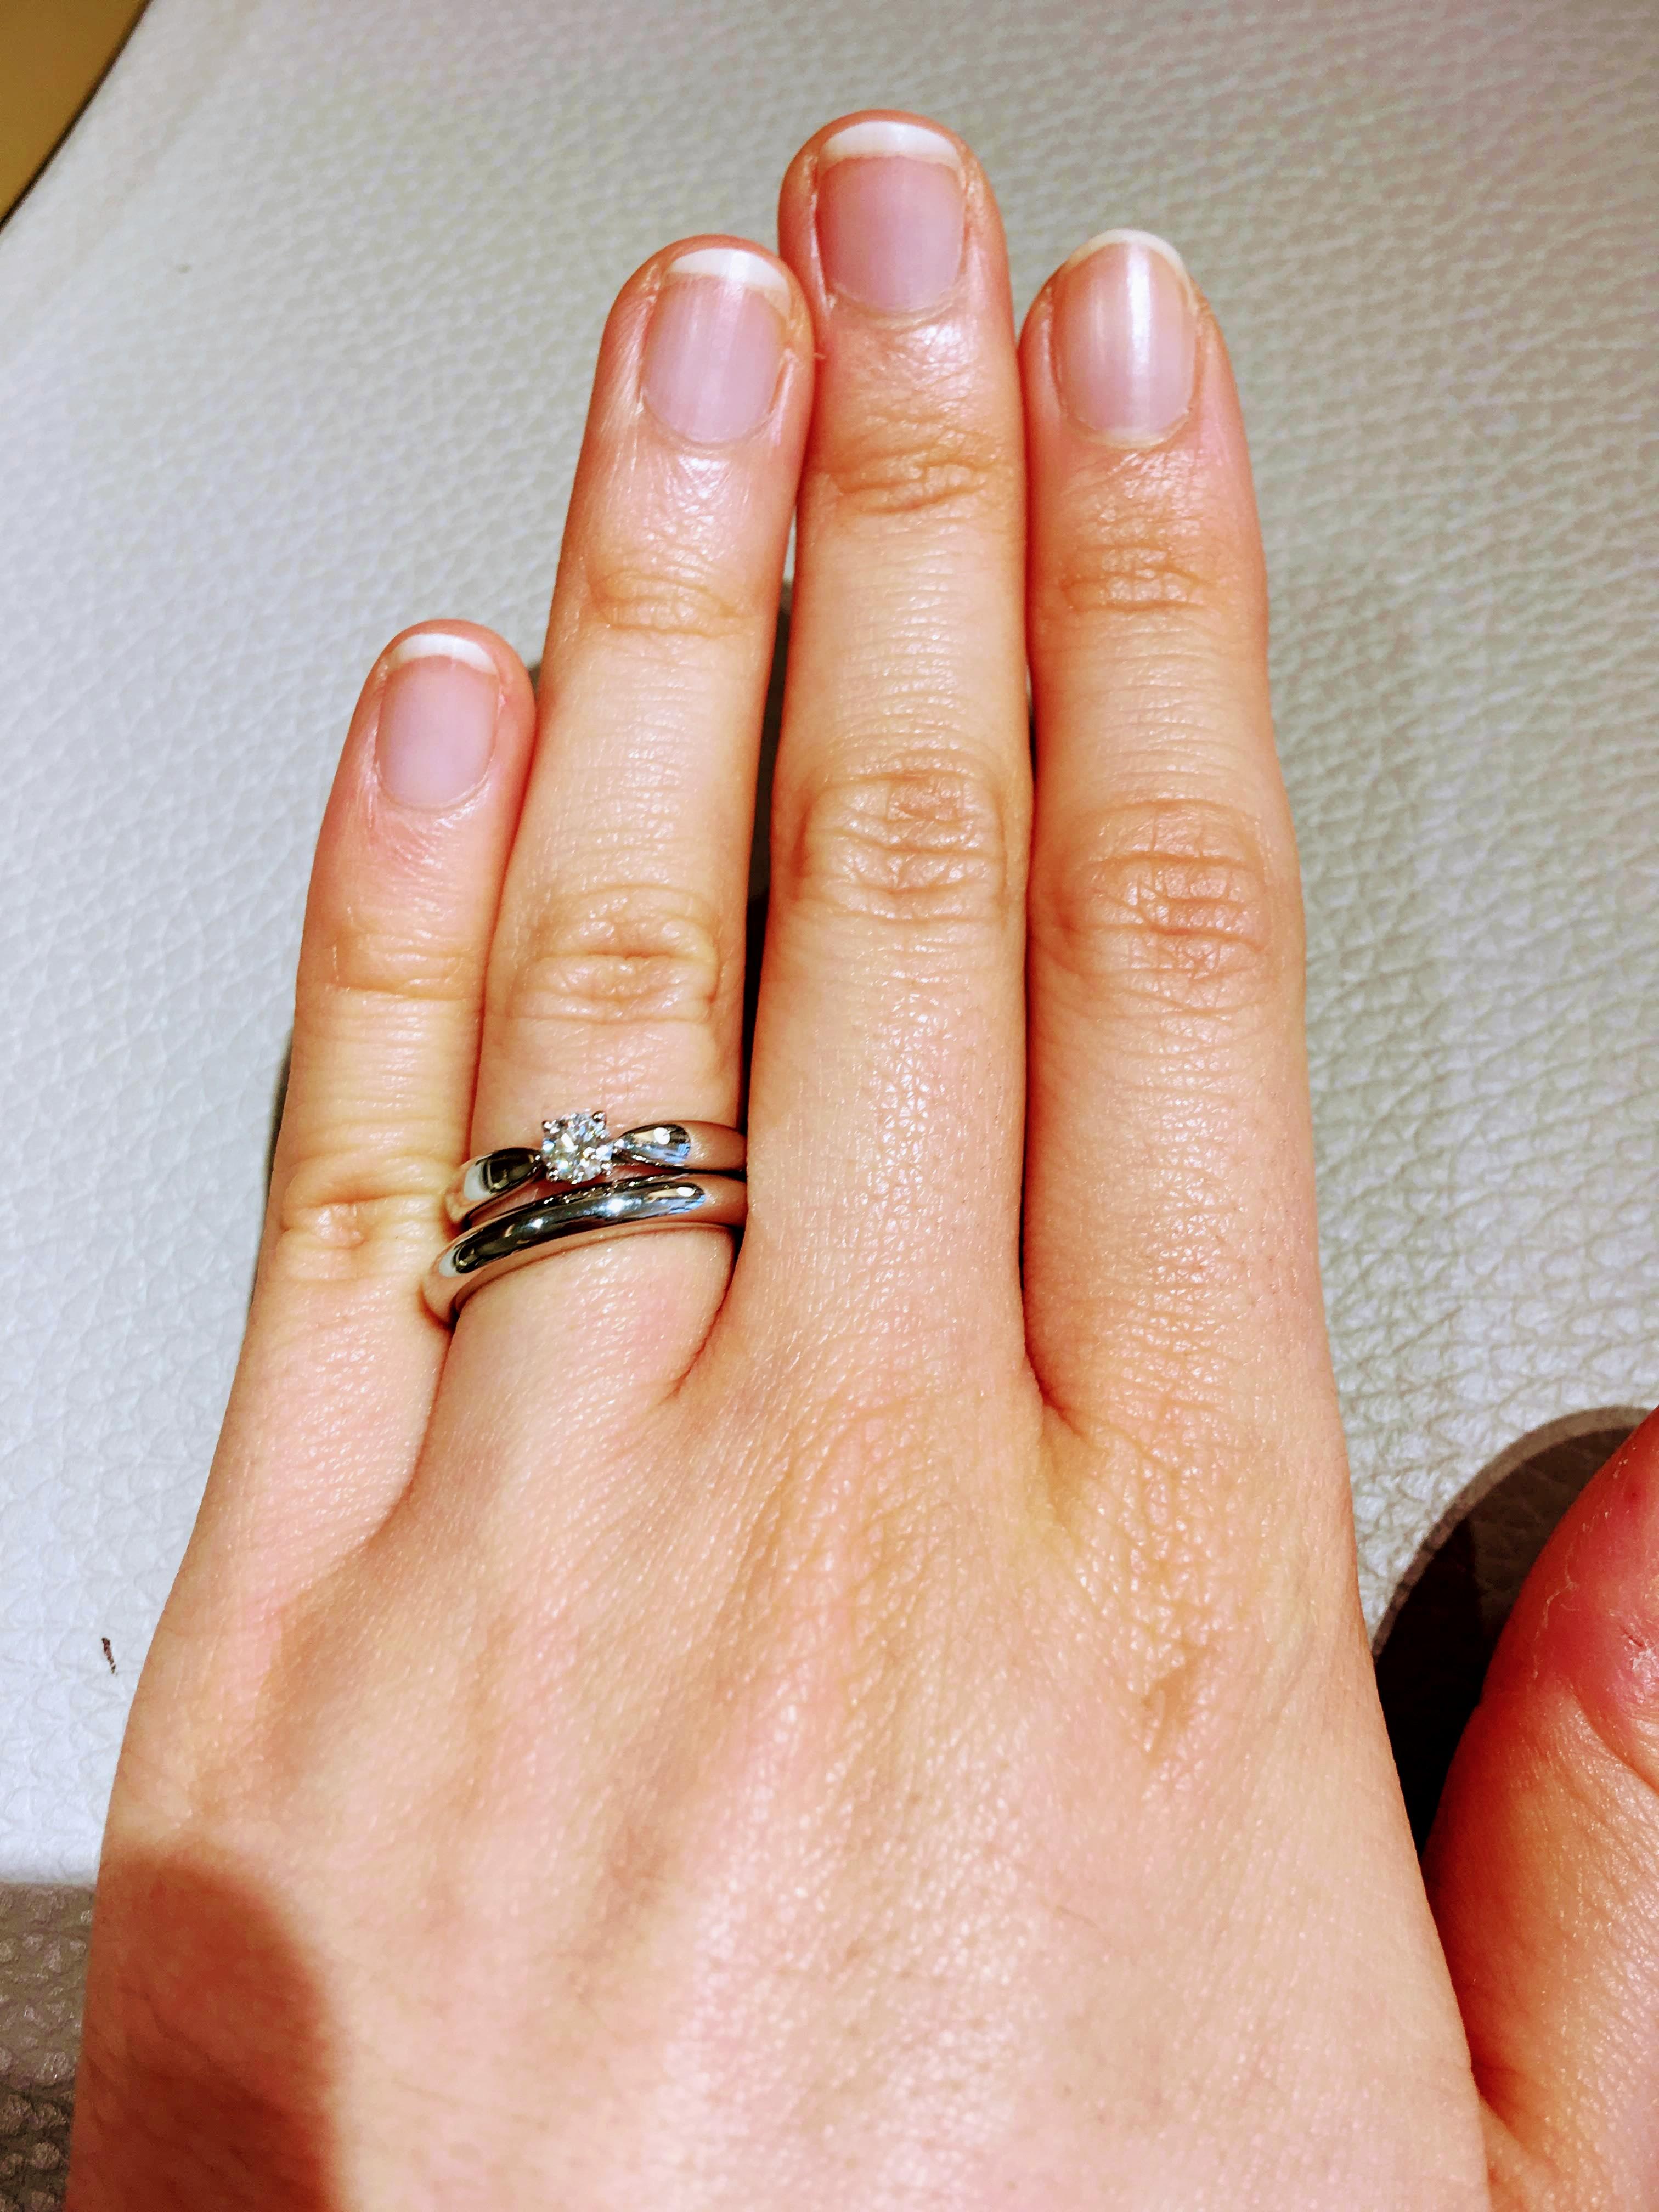 designer fashion c22d1 a9b89 結婚指輪ブランド「ショーメ」銀座本店へ実際に行ってみた|結婚 ...